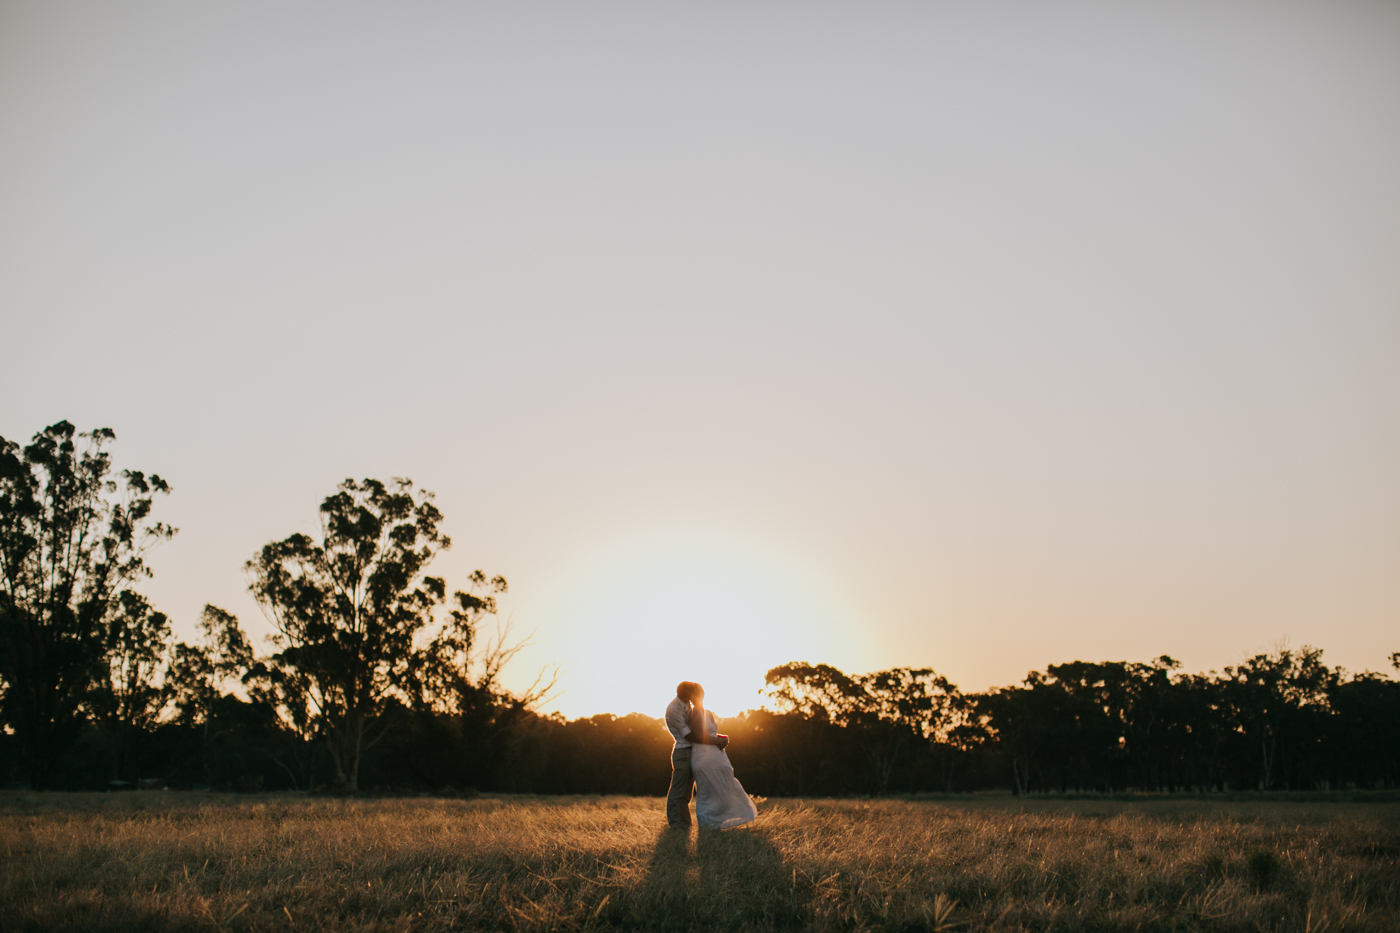 Nicolle & Jacob - Dubbo Wedding - Country Australia - Samantha Heather Photography-250.jpg